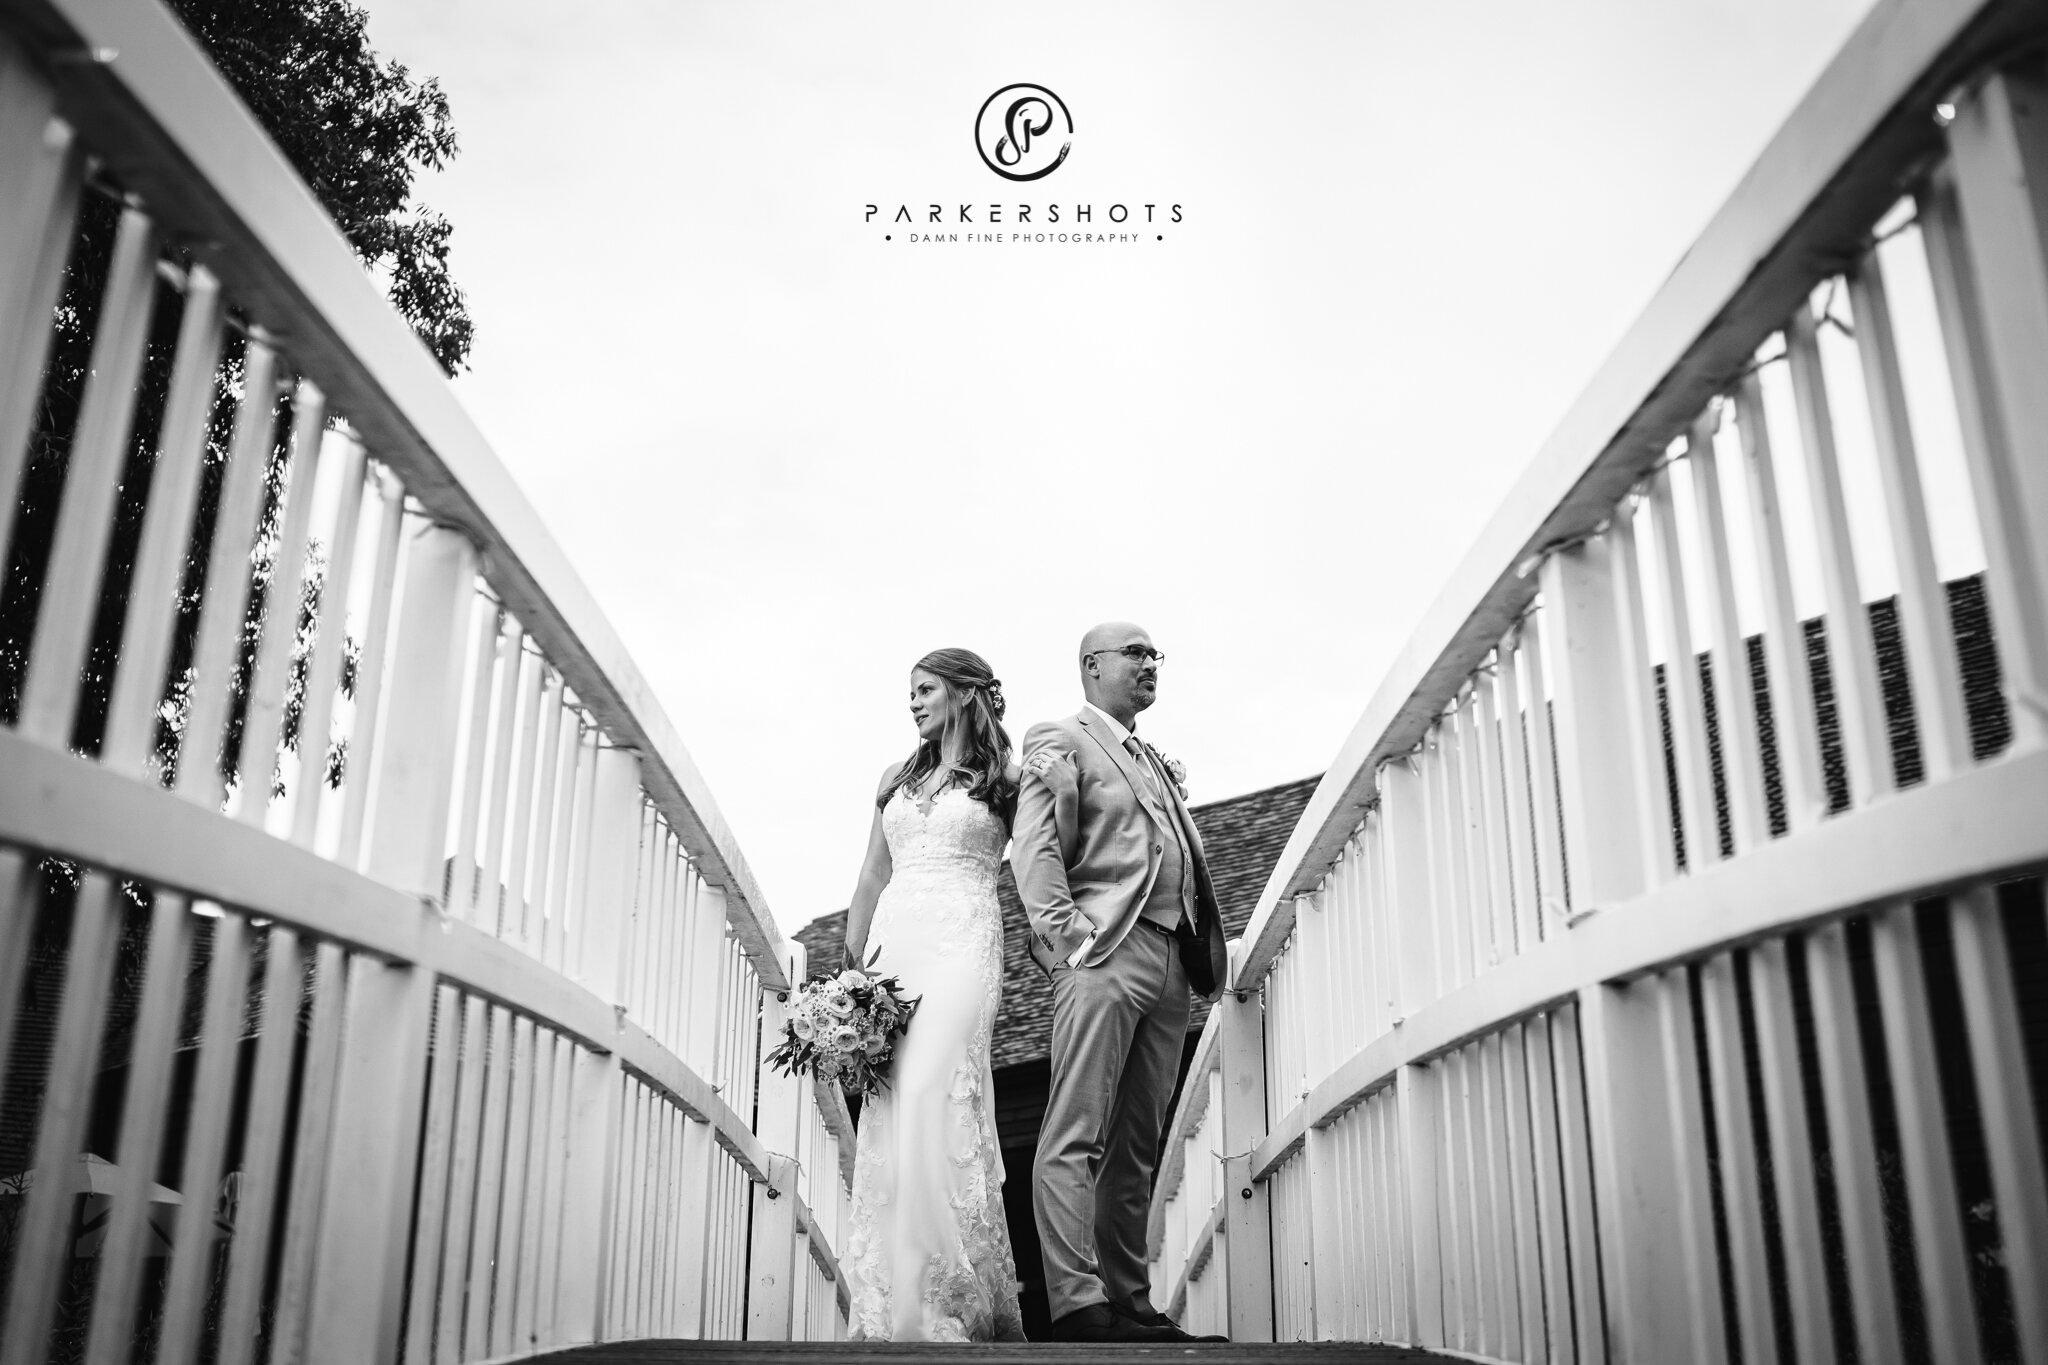 Winters Barns Wedding Photographer - Karen & Matt's wedding